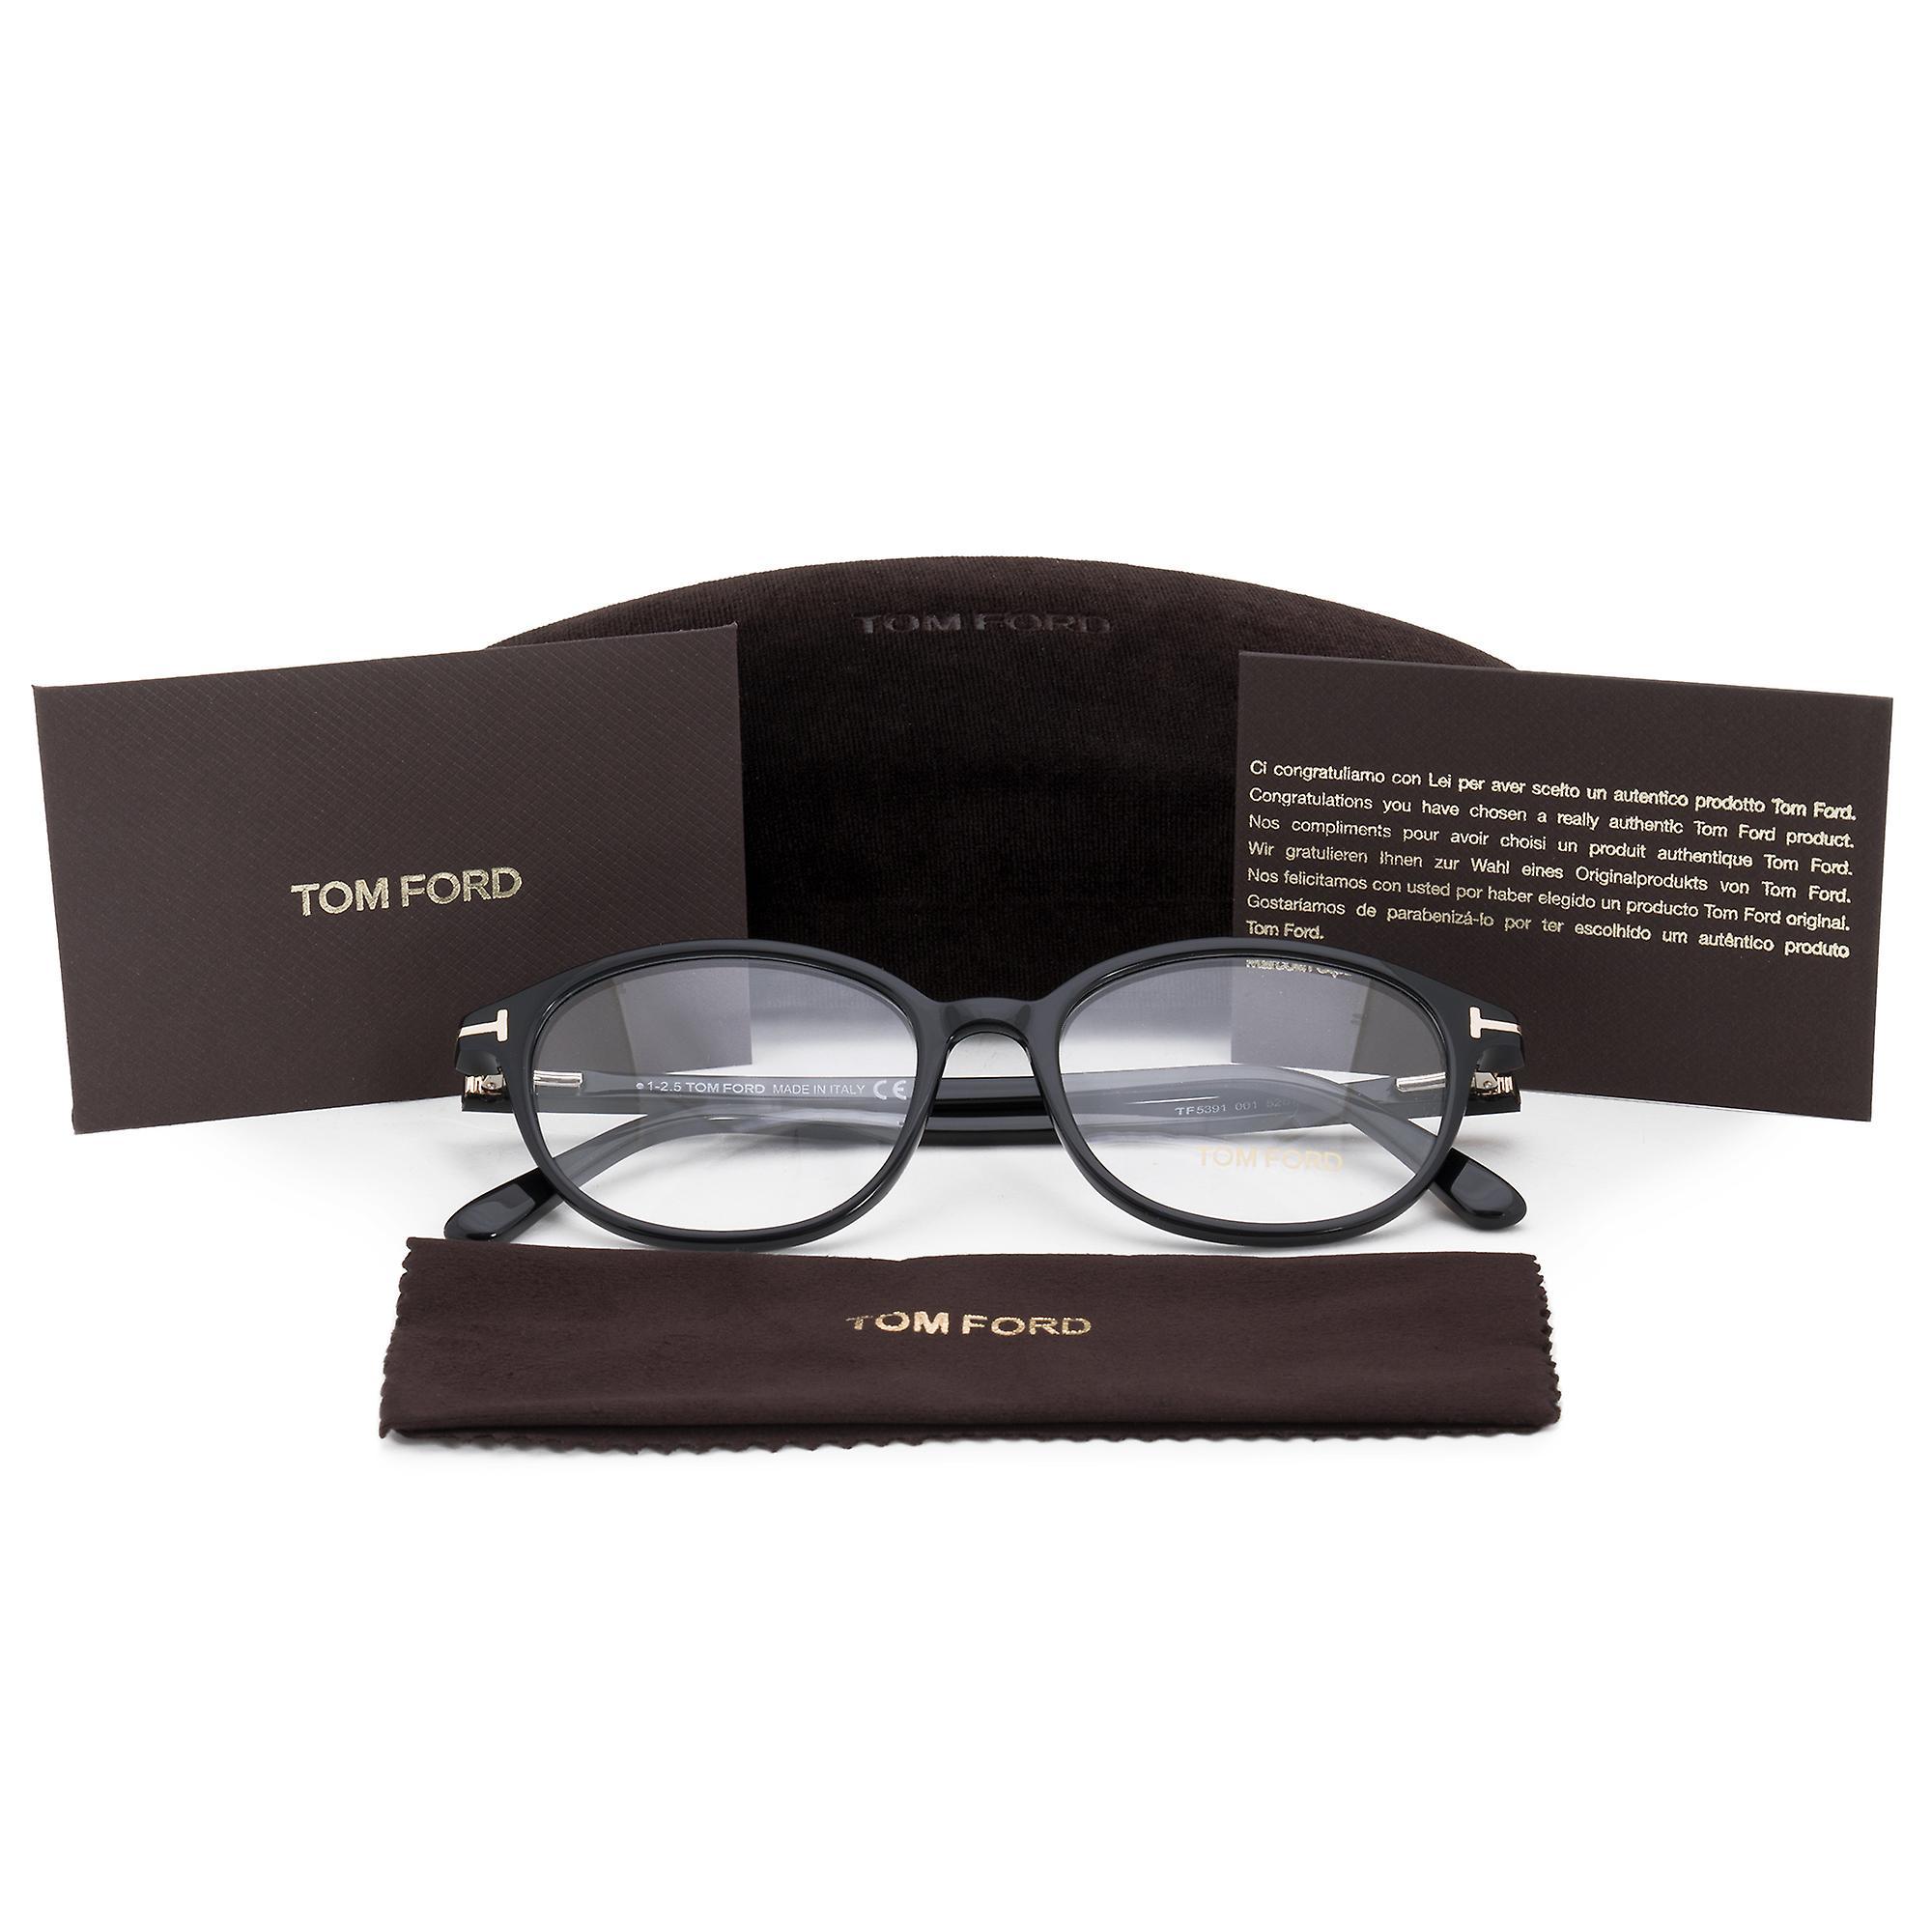 Tom Ford FT5391 1 Square | Black| Eyeglass Frames